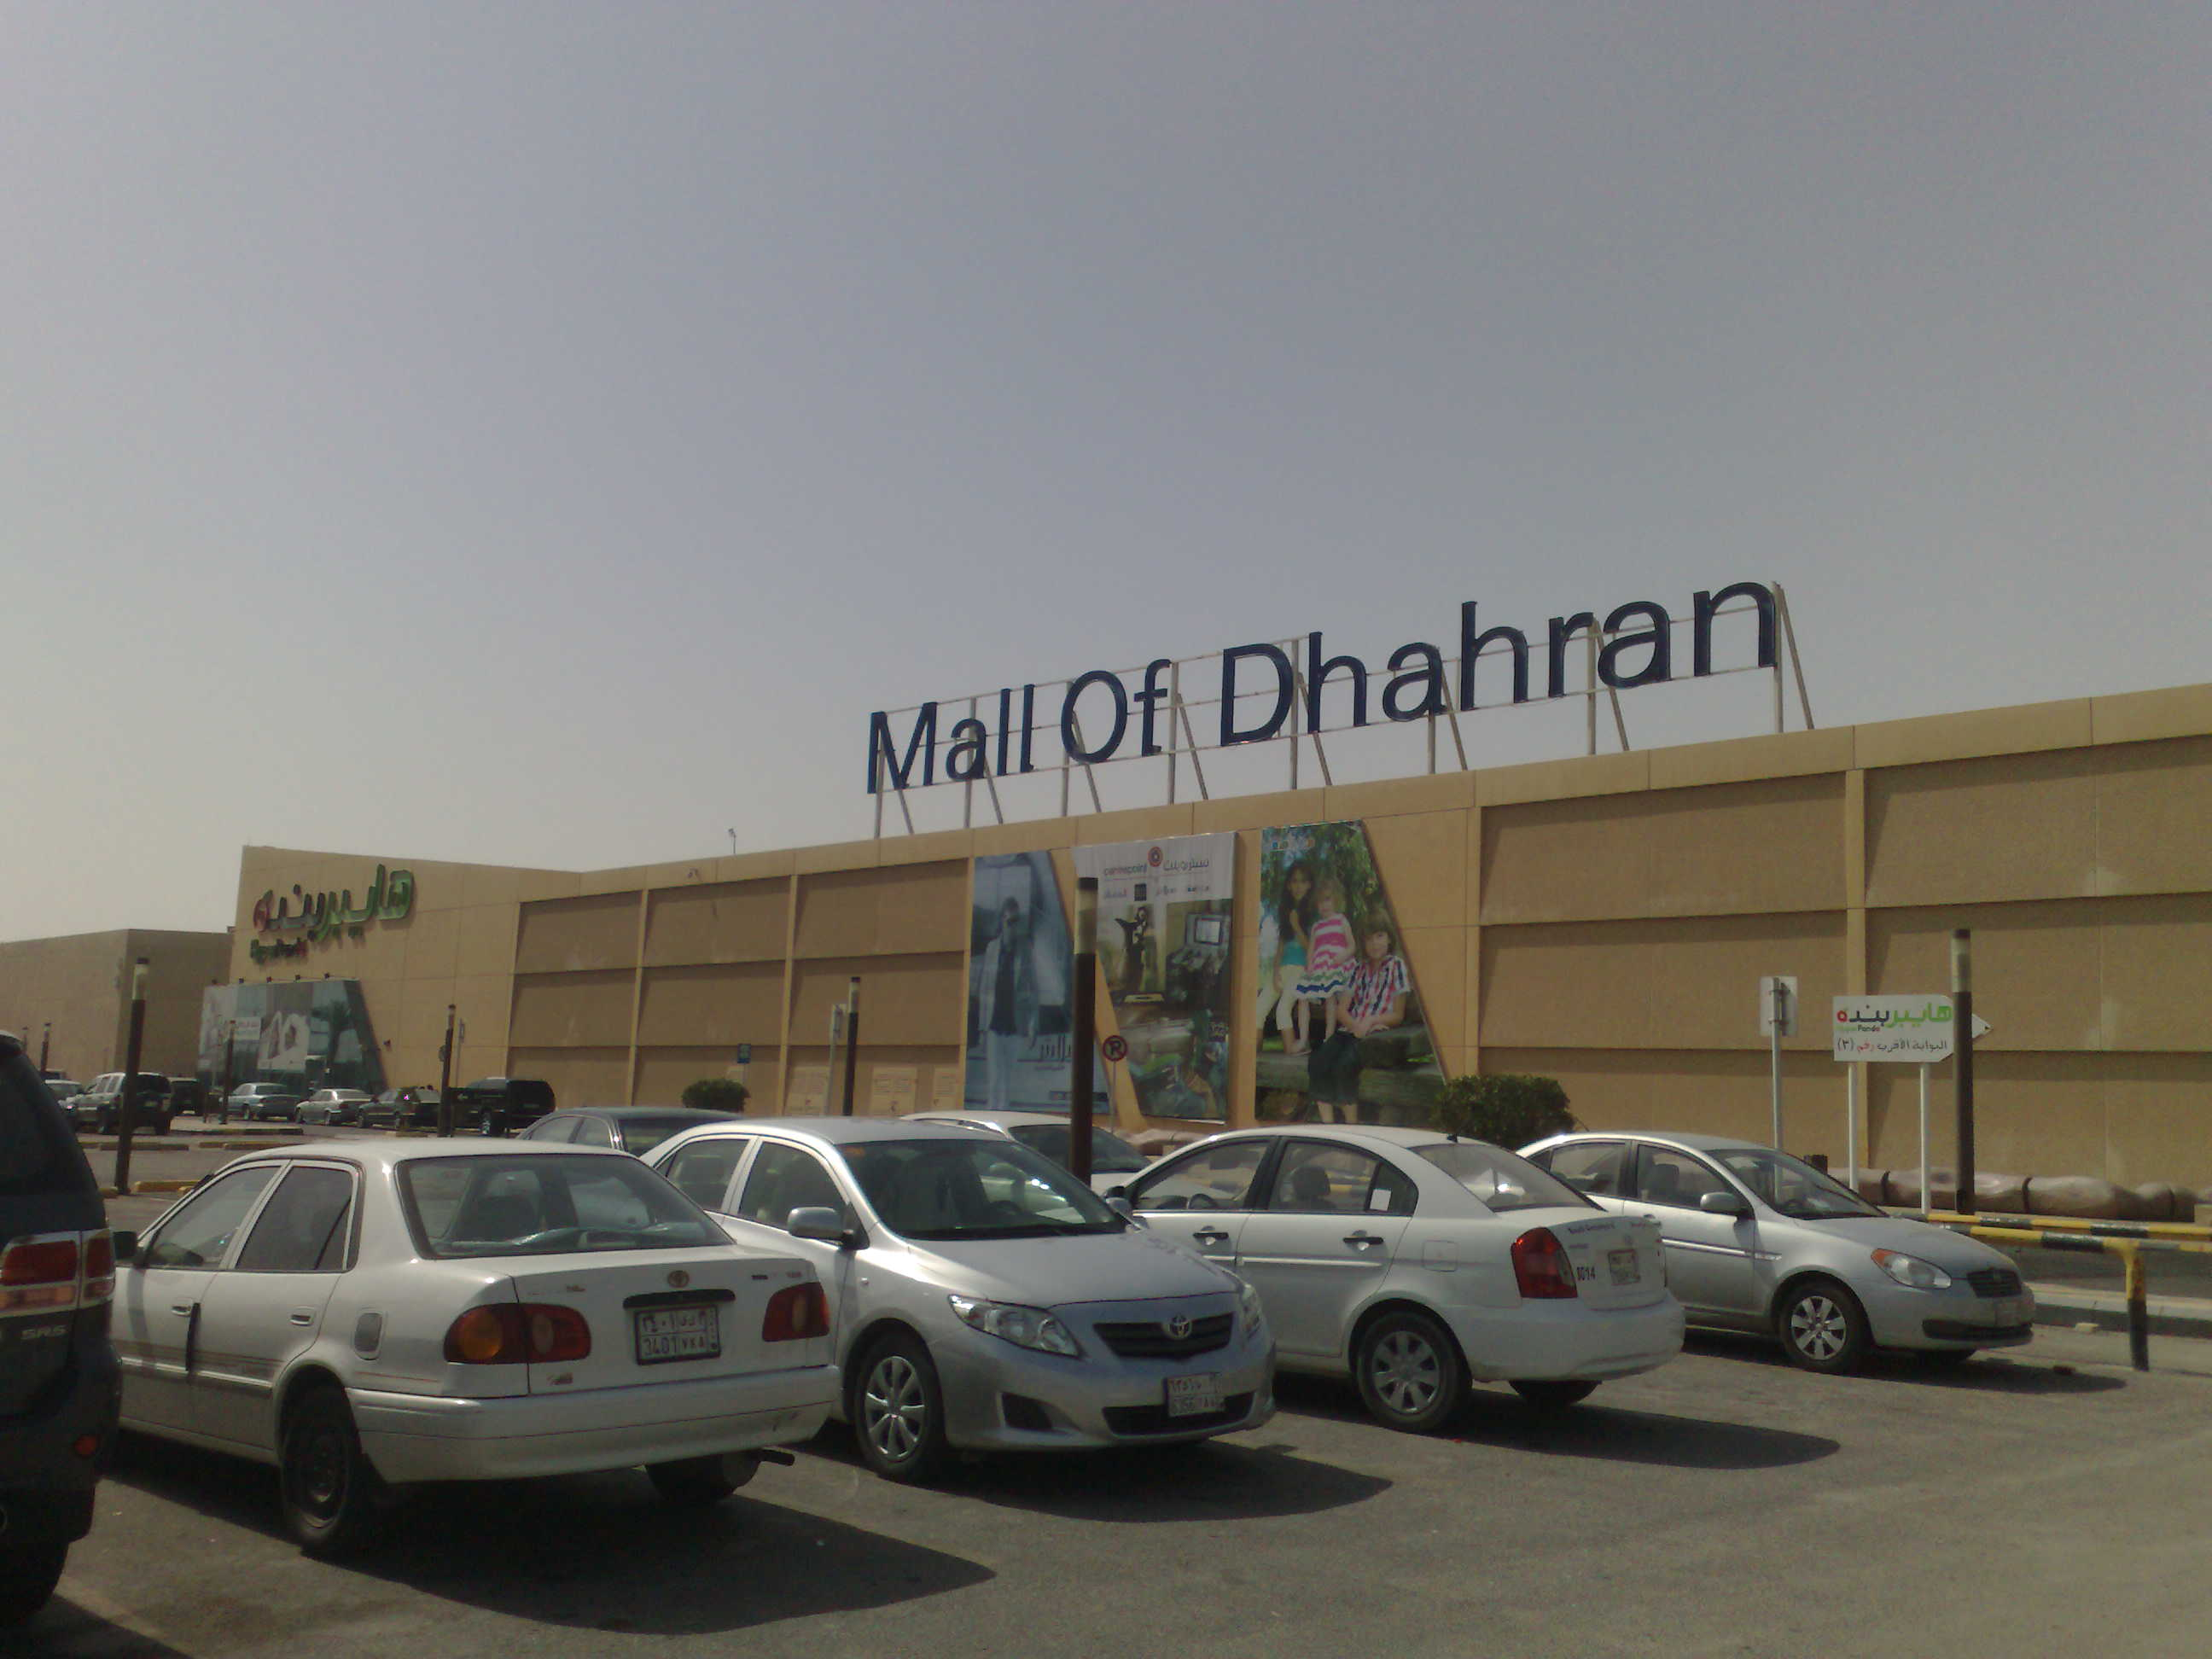 Dhahran Saudi Arabia  city photo : Mall Of Dhahran en Dhahran, Saudi Arabia